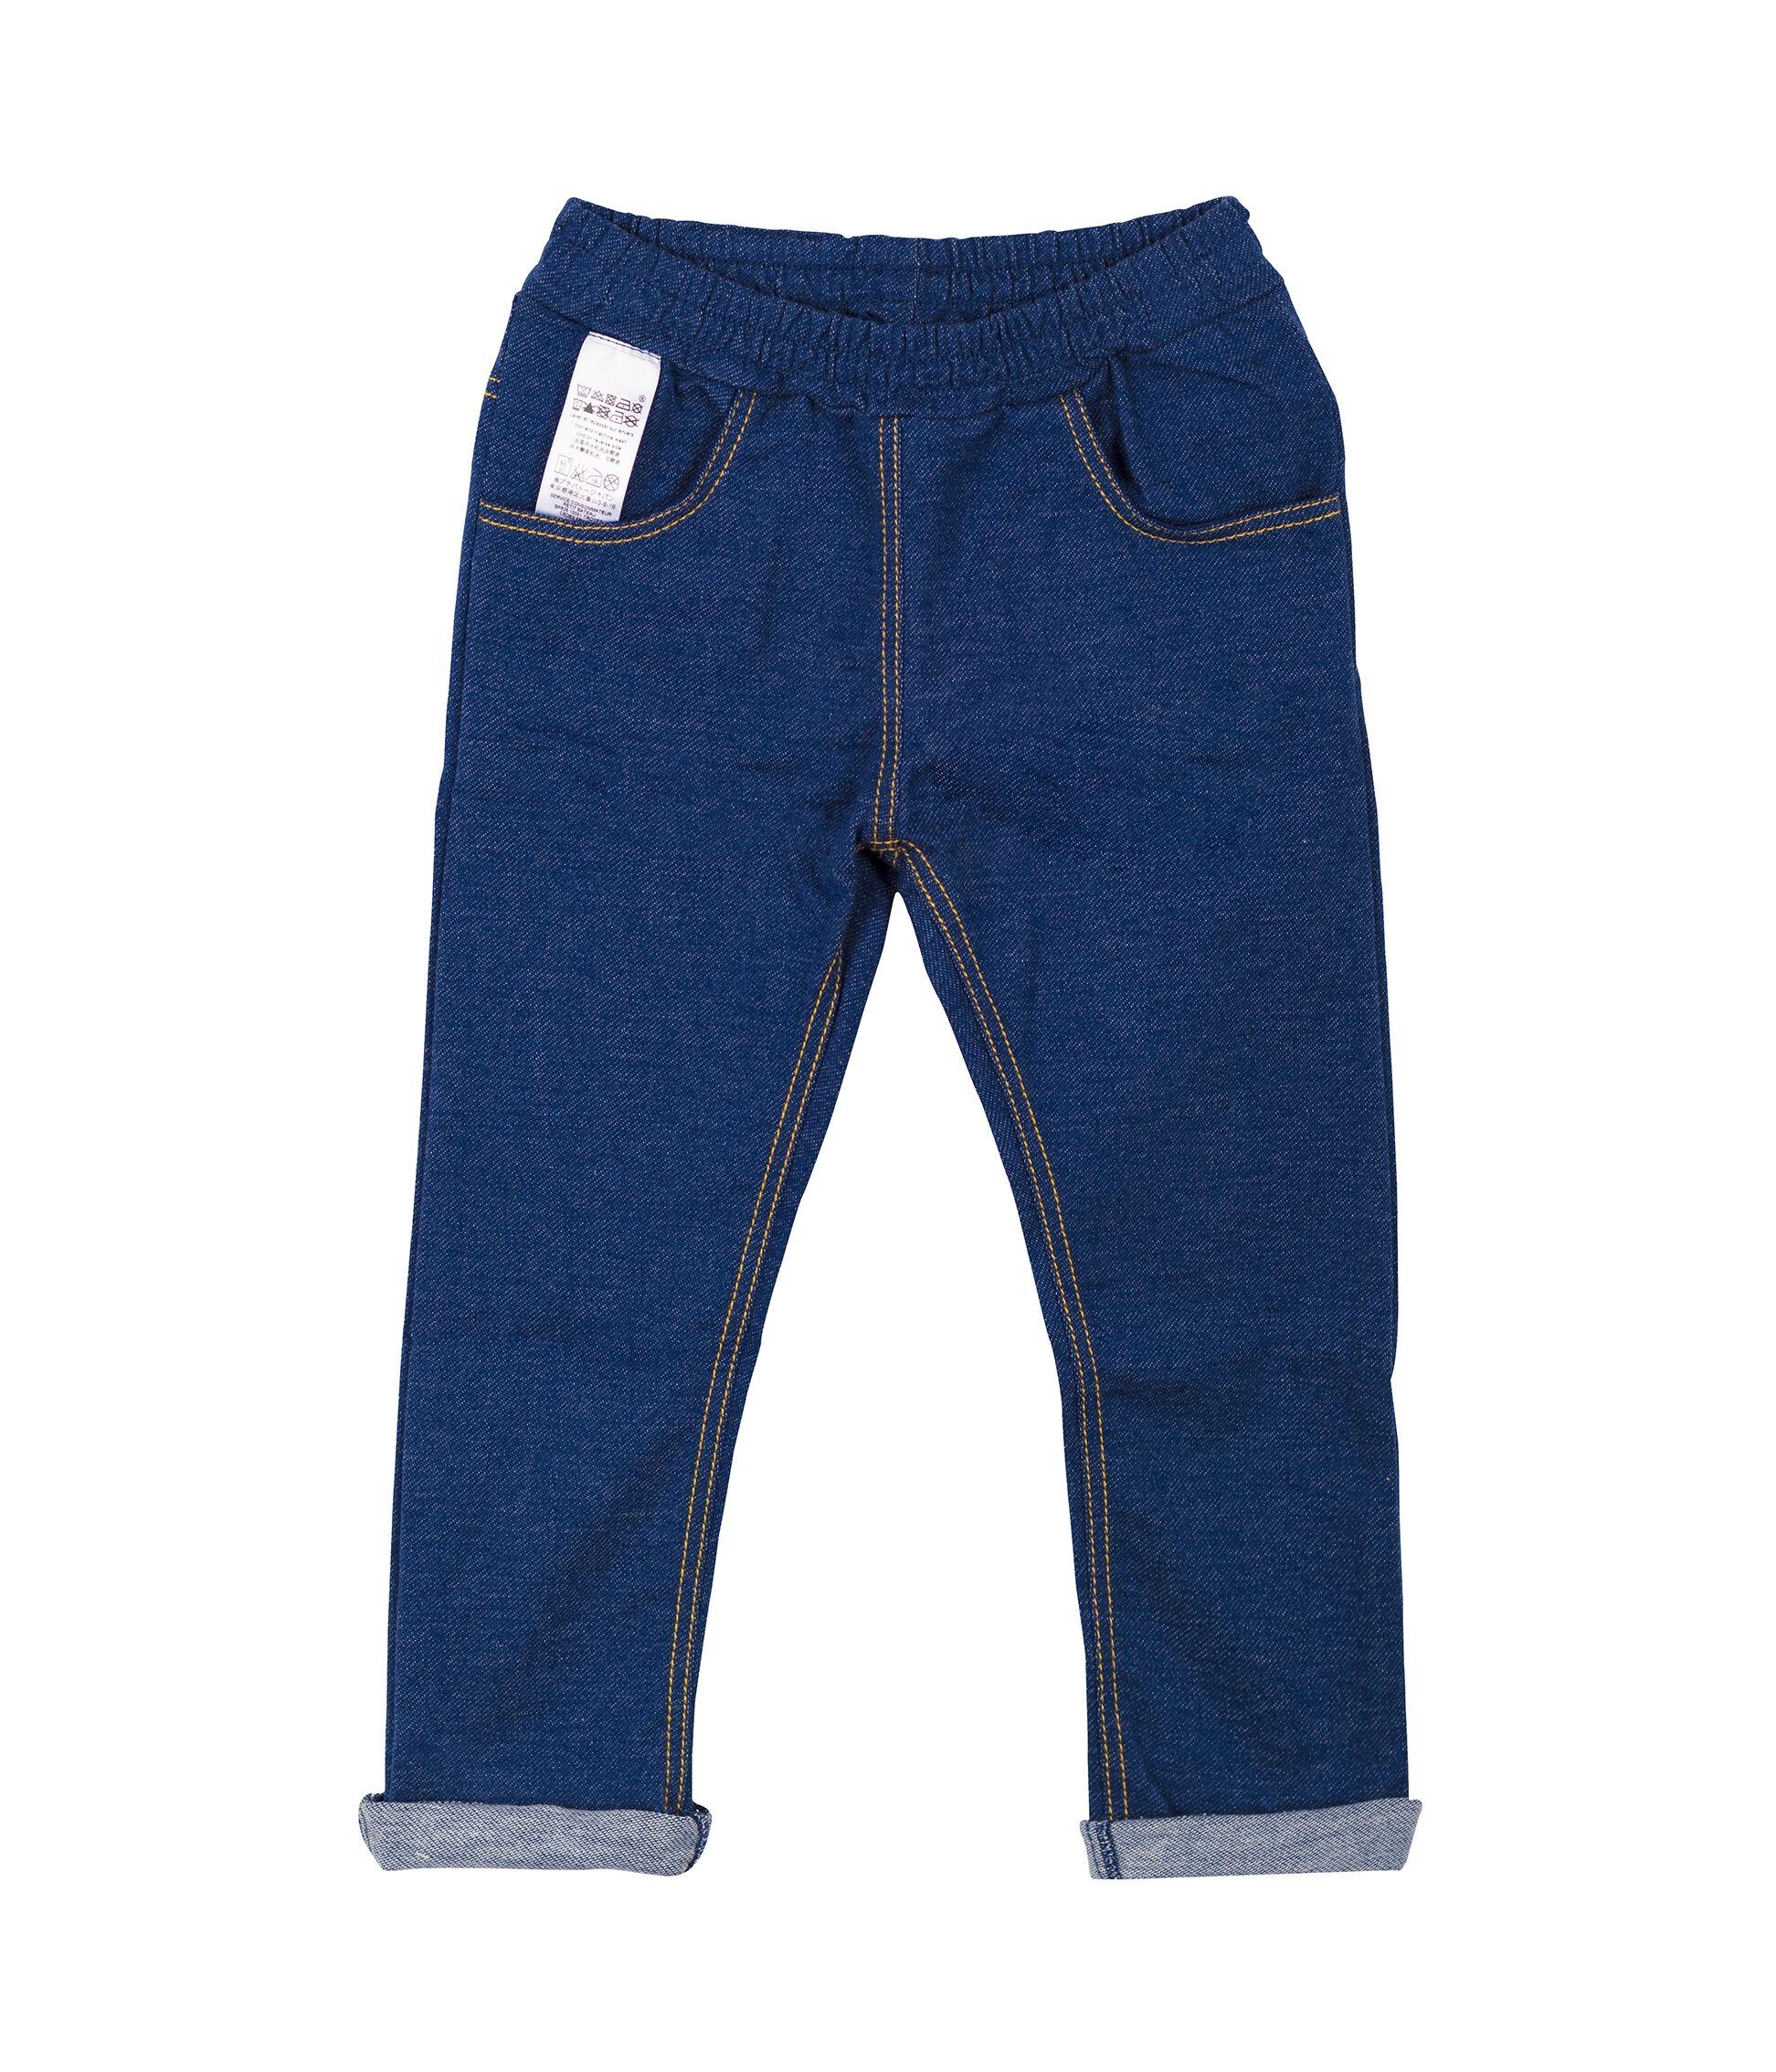 Petit Bateau Pantaloni Unisex-Bimbi